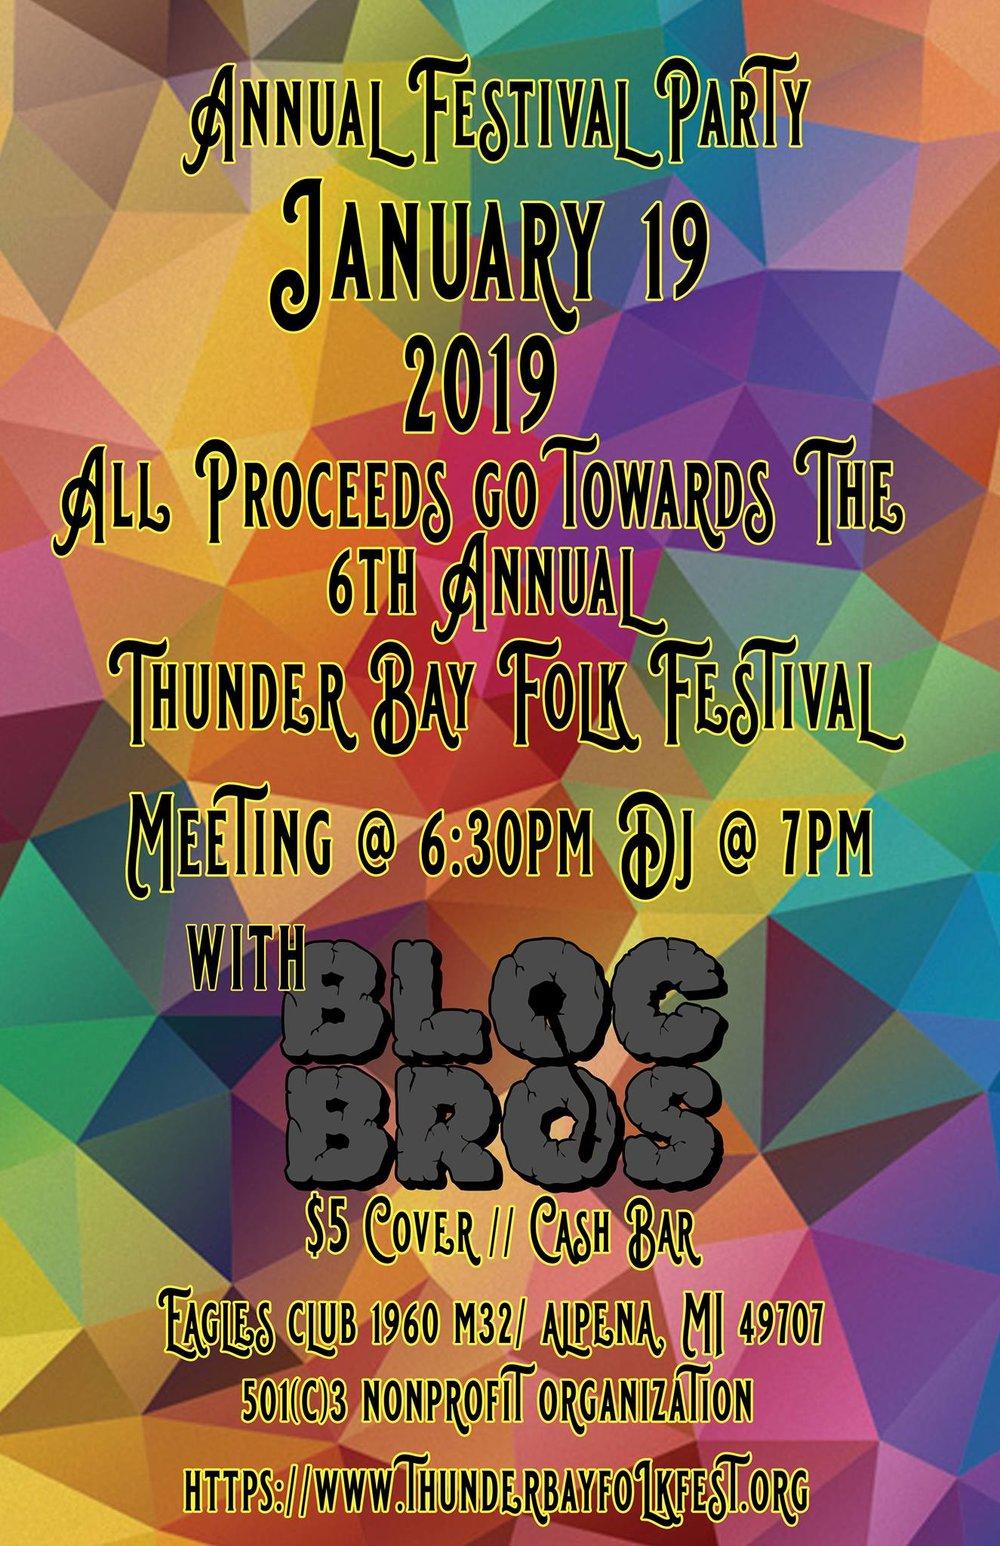 2019-01-19-TBFS-Annual-Festival-Party.jpg